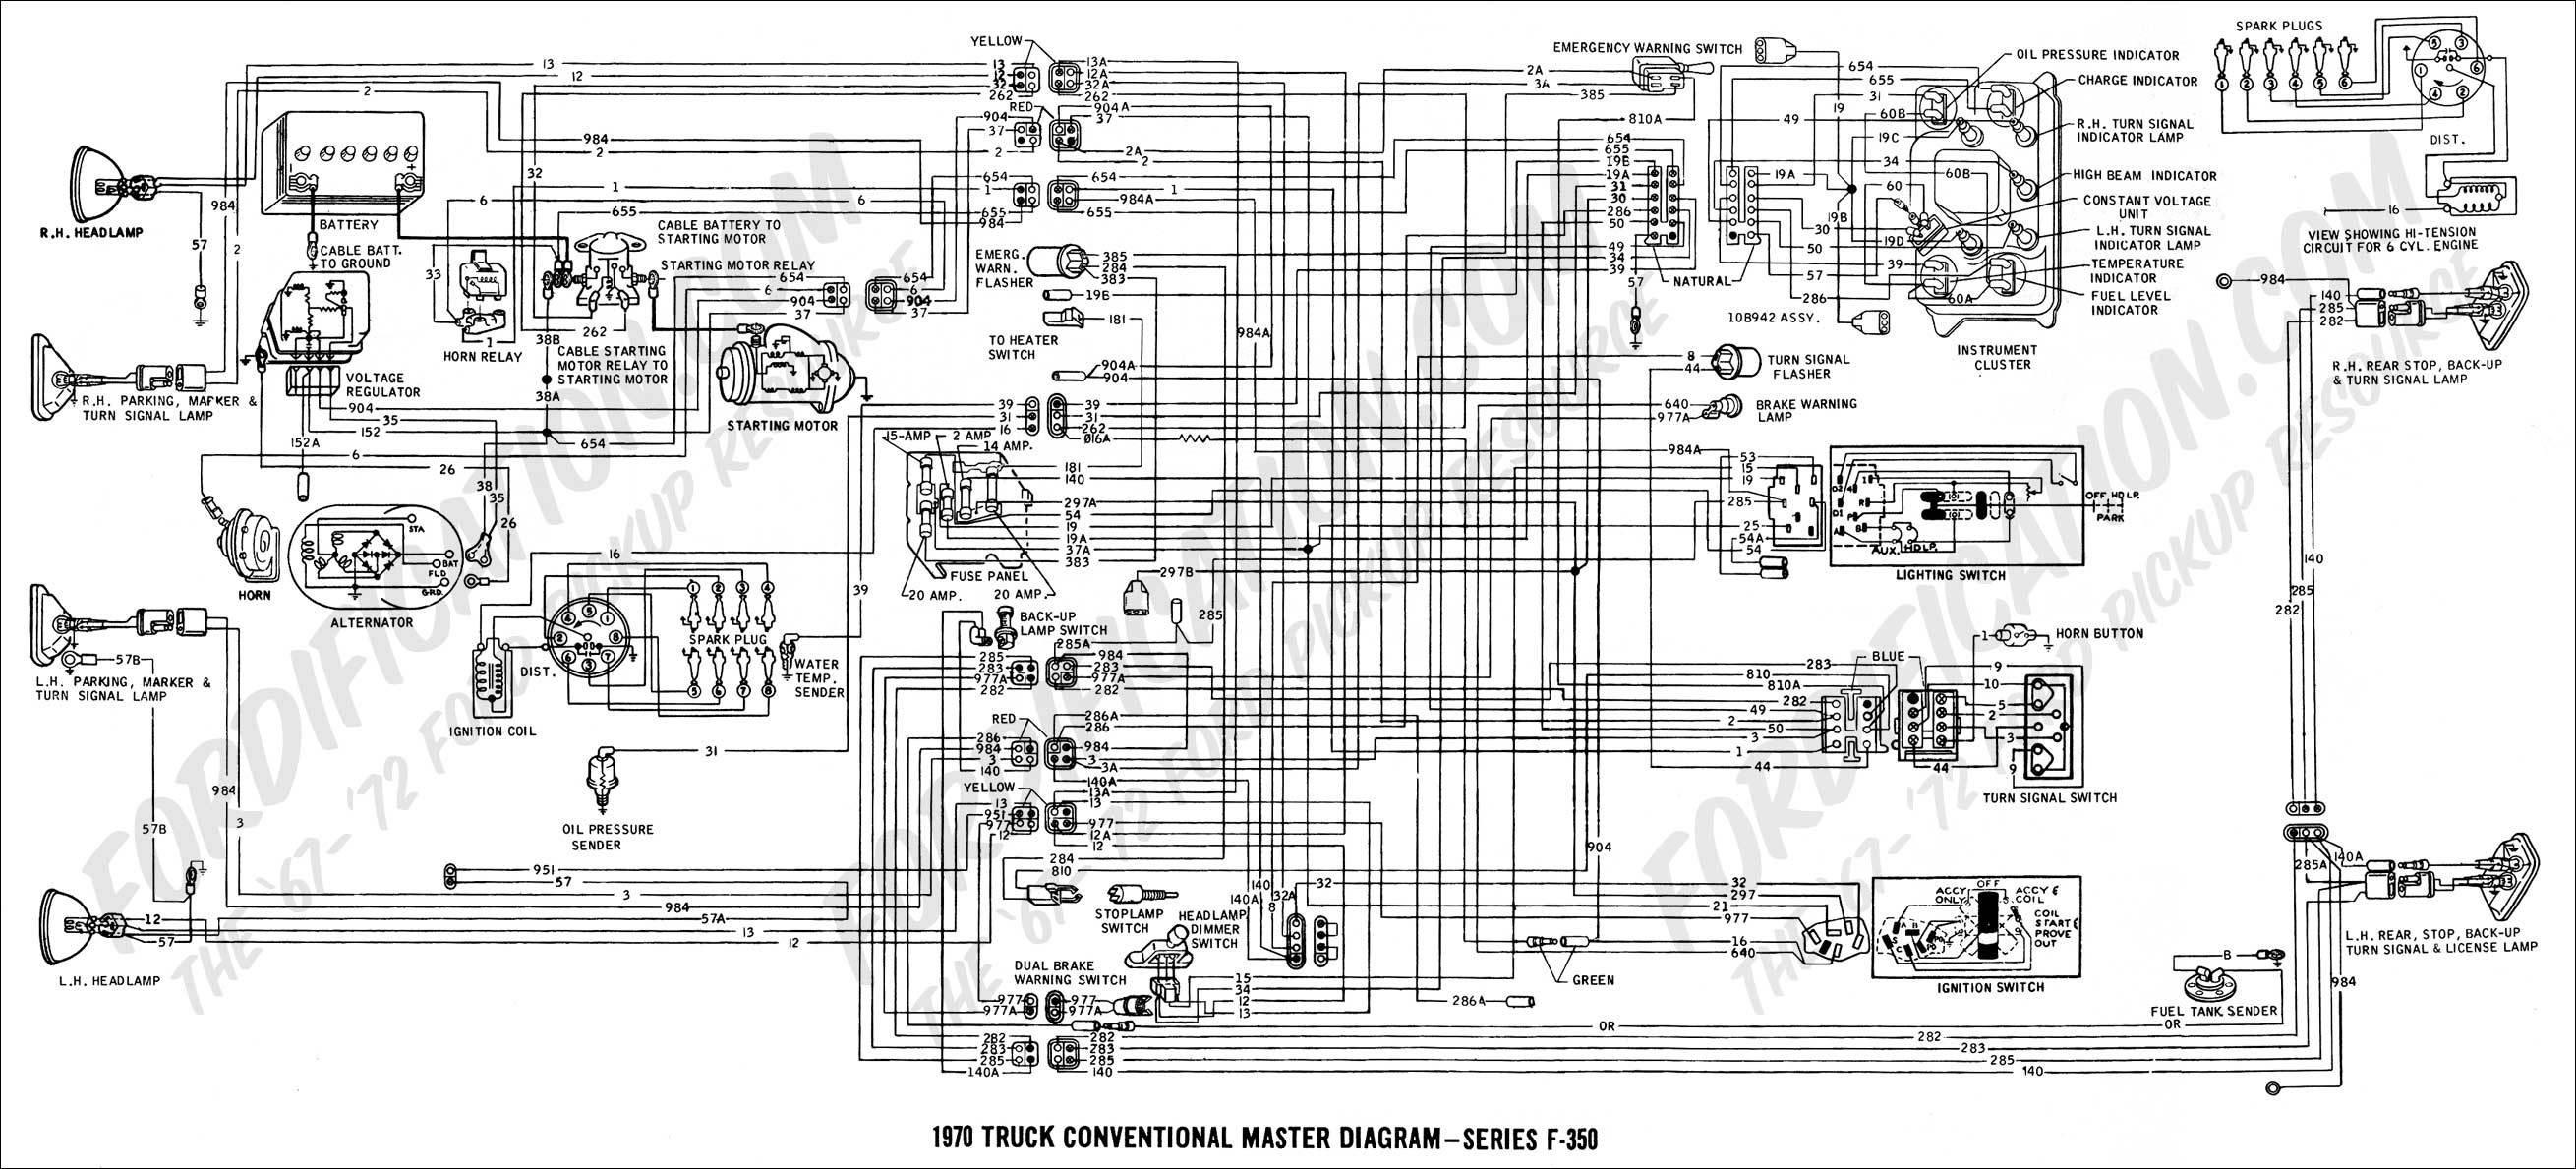 Honda Civik Ek Engine Wiring Diagram Diagram] Kenworth T600 Wiring Diagram Full Version Hd Of Honda Civik Ek Engine Wiring Diagram